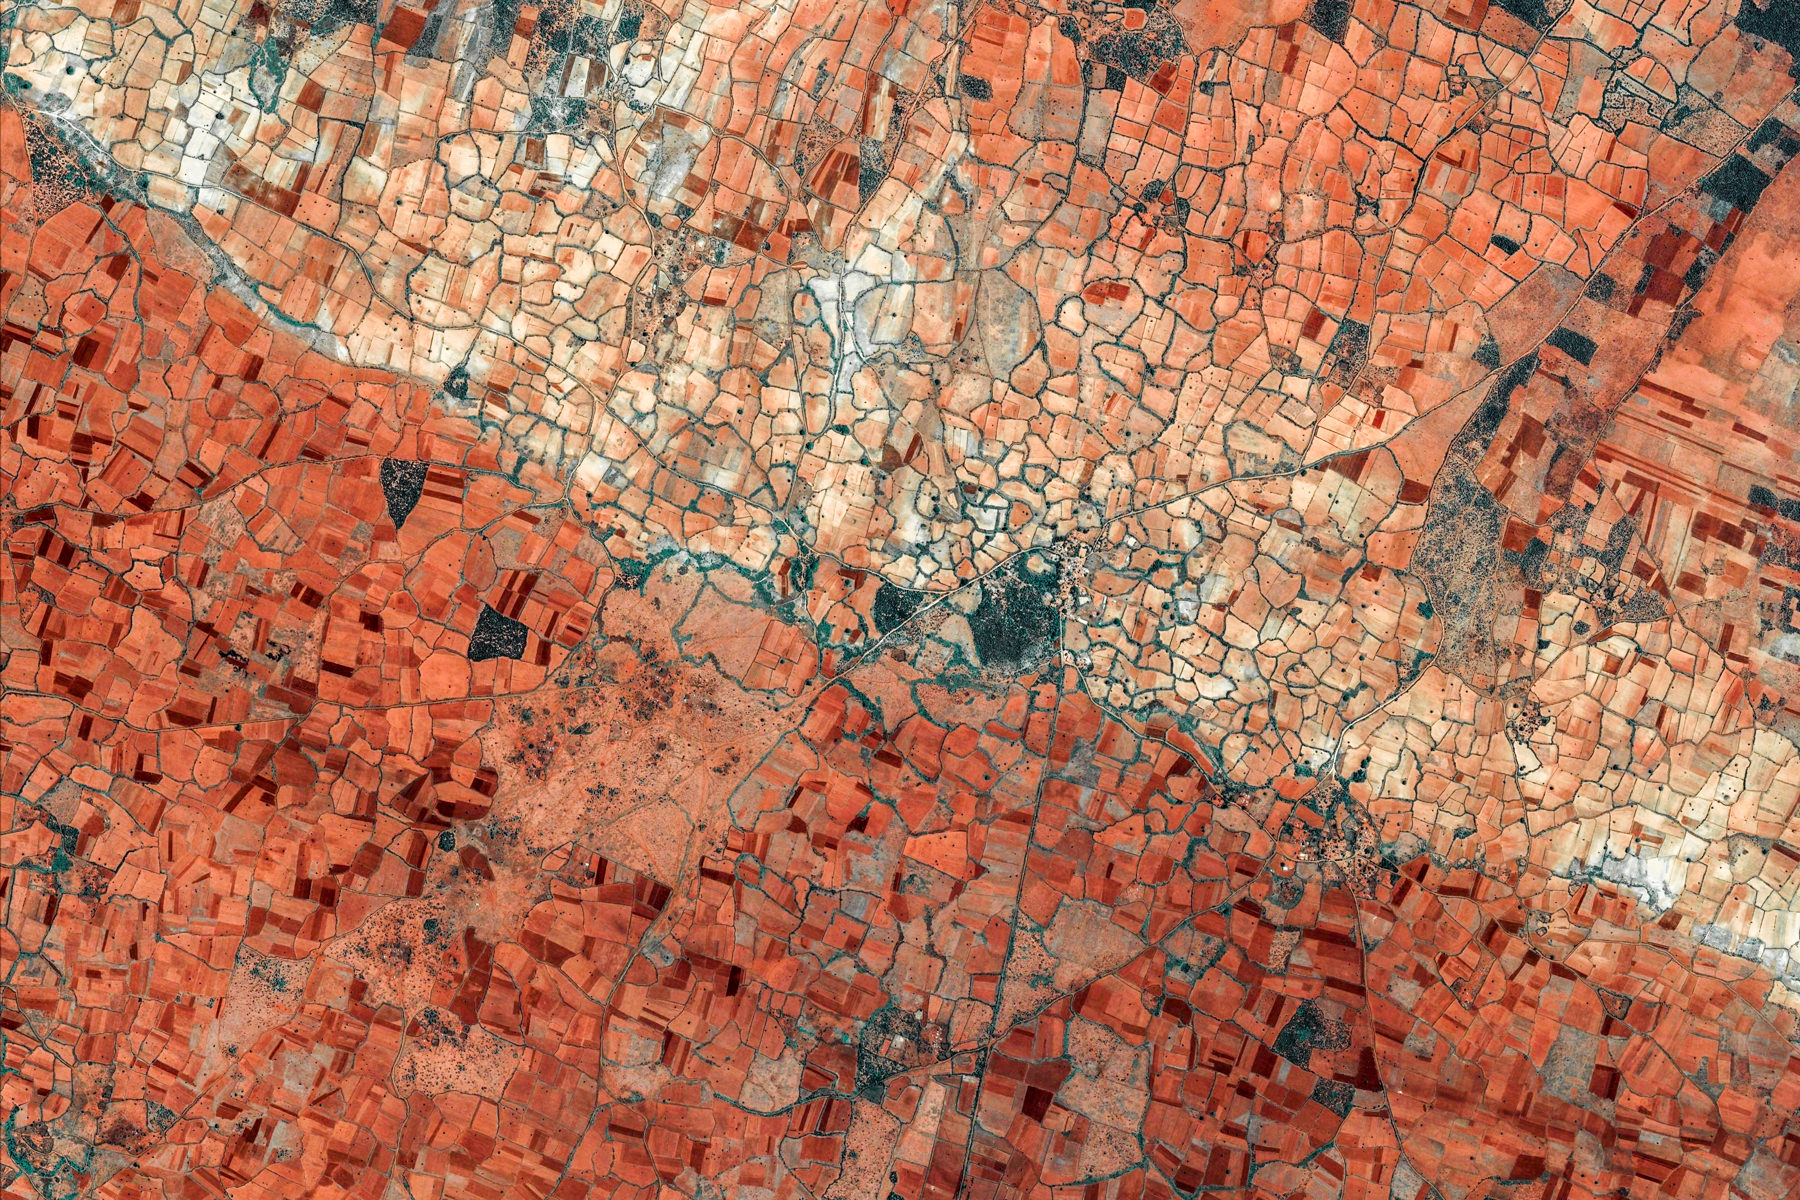 google-earth-Madagascar-Anosy-12626